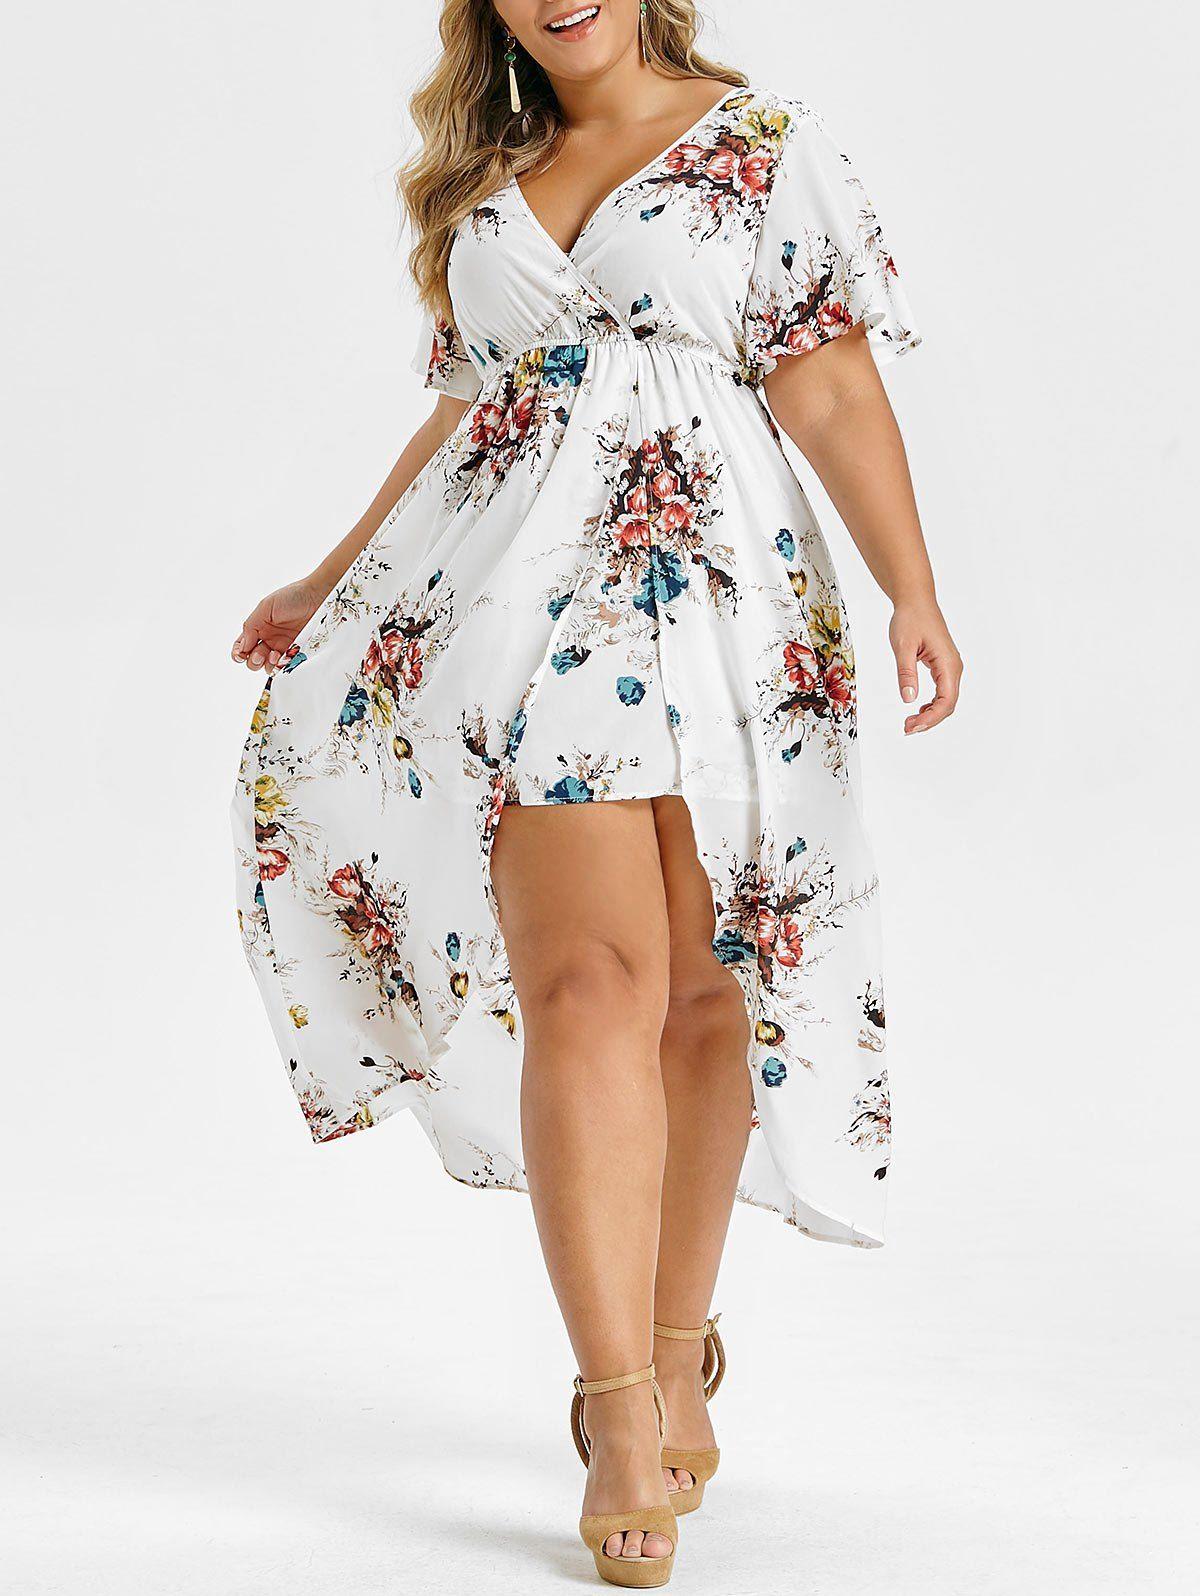 Plus Size Handkerchief Ruffled Floral Print Tank Top In 2021 High Low Maxi Dress Maxi Dress Plus Size Dresses [ 1596 x 1200 Pixel ]